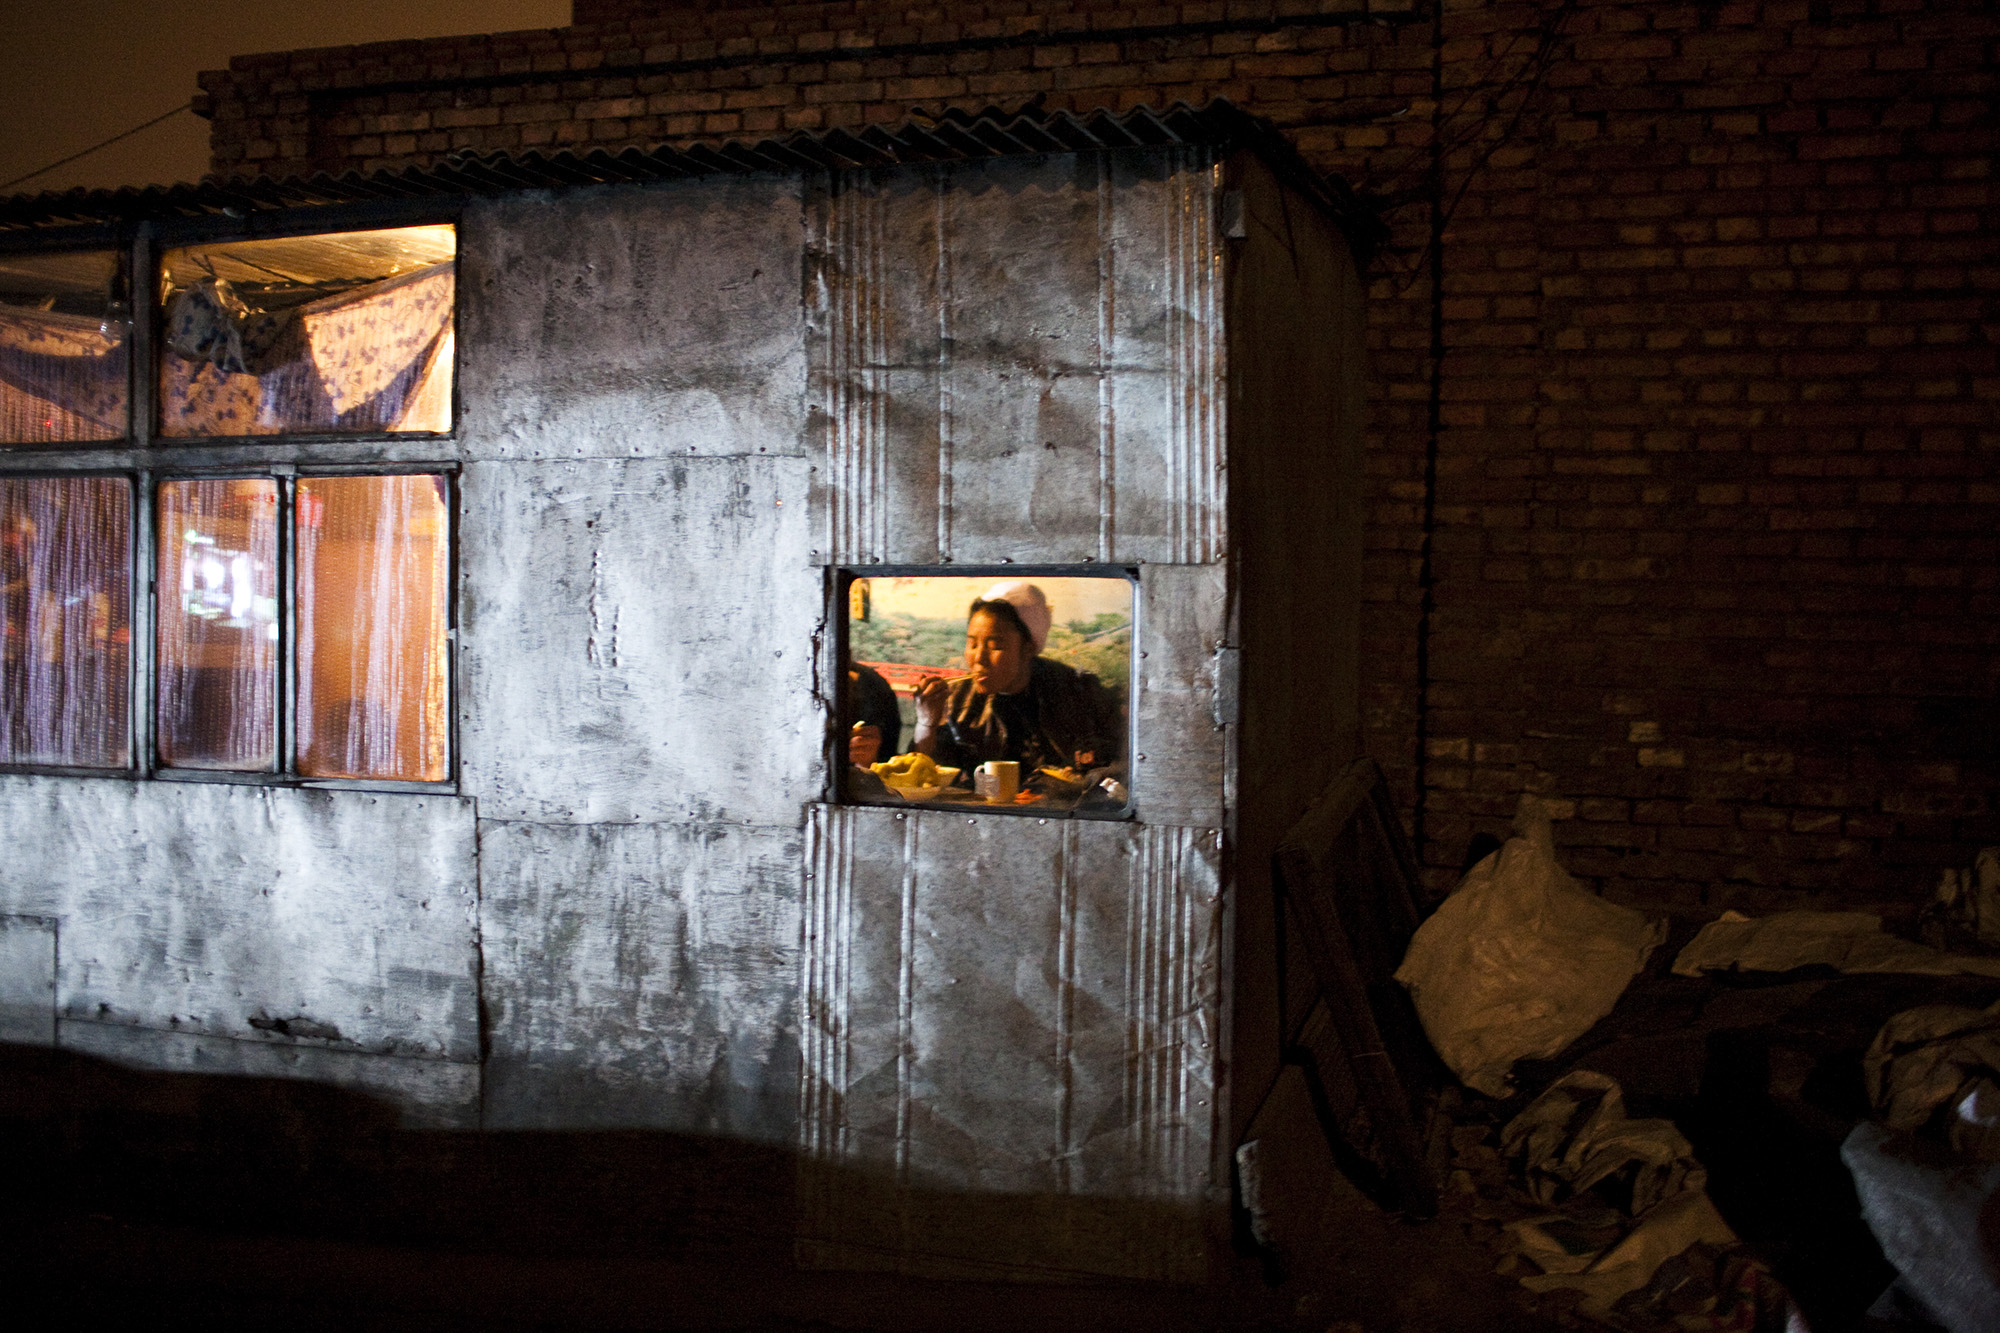 A coal yard boss eats inside her home.